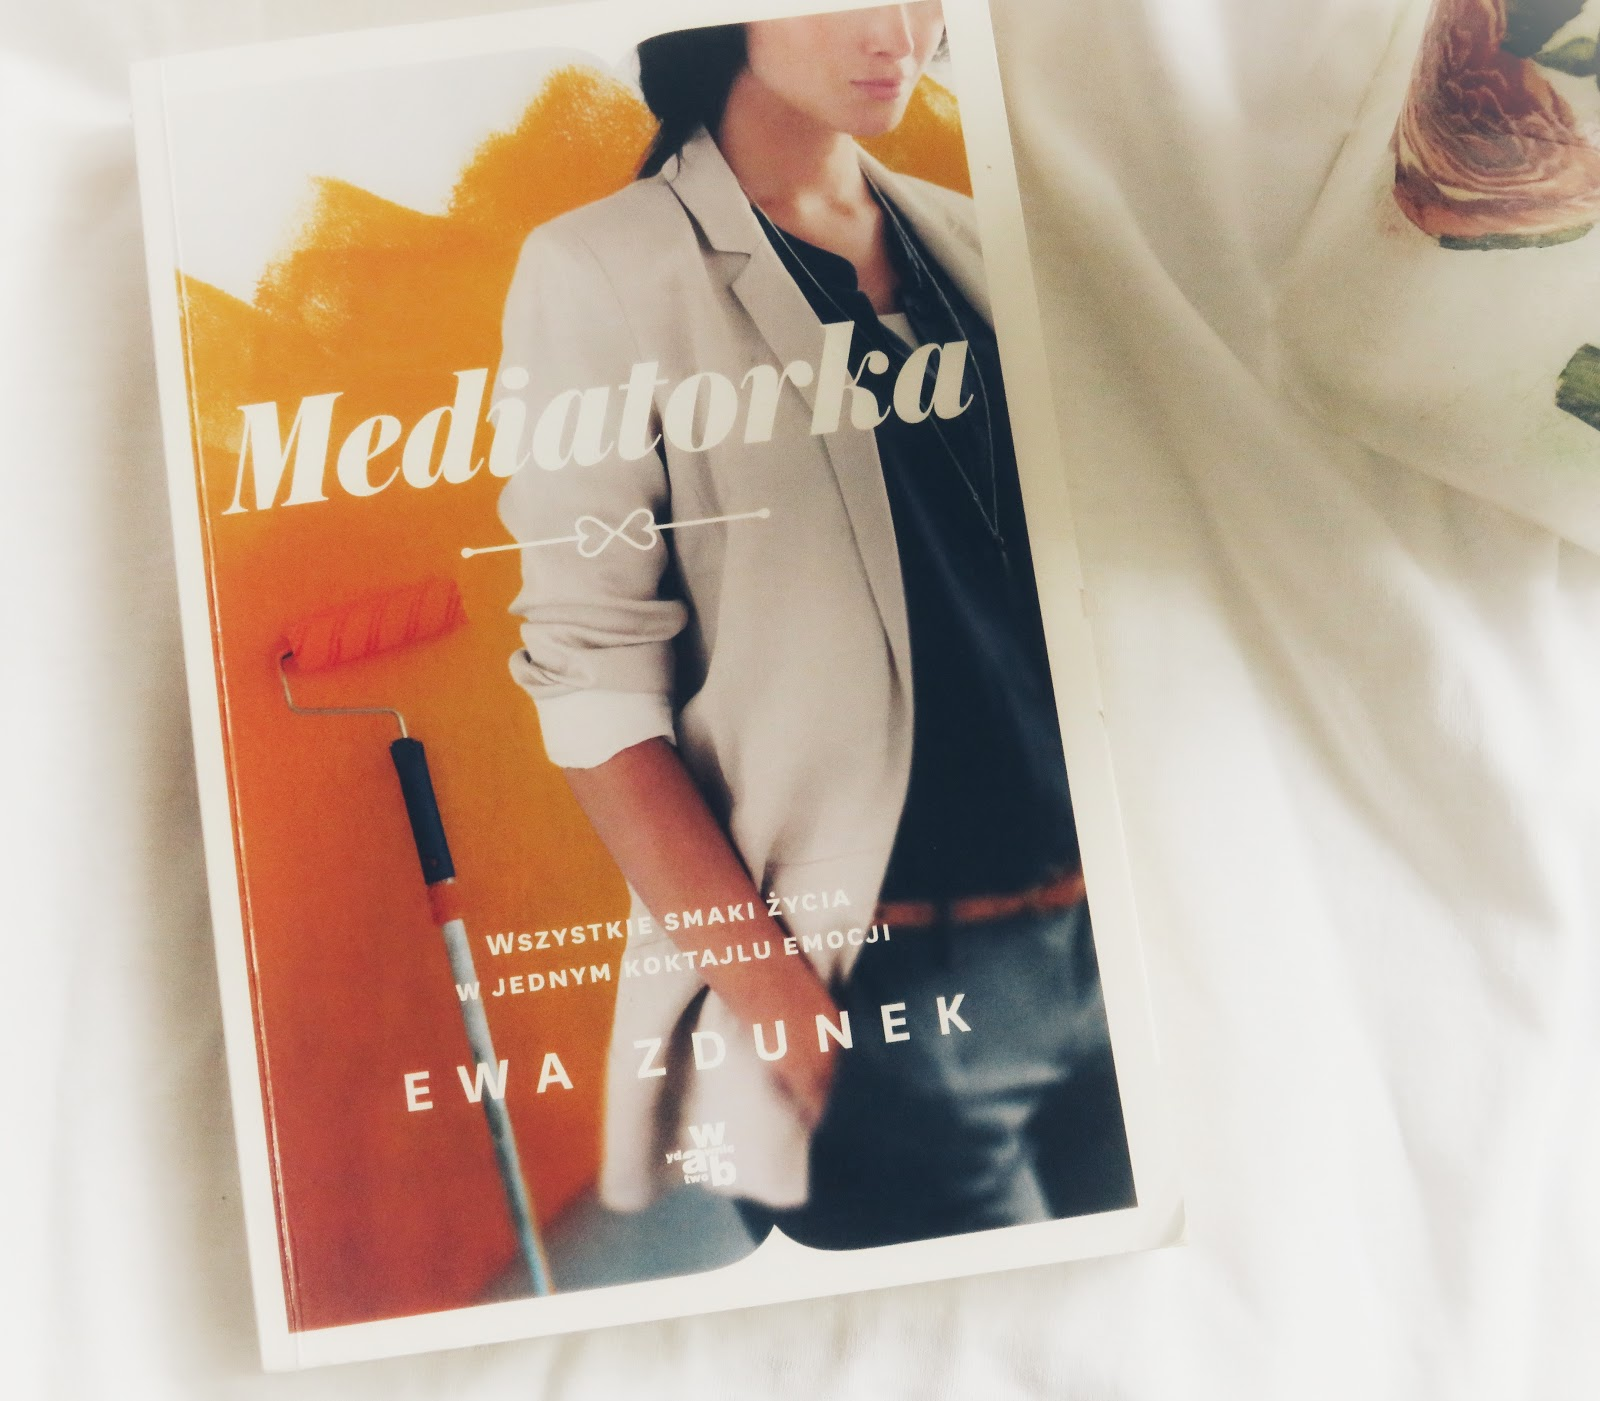 Mediatorka Ewa Zdunek – recenzja